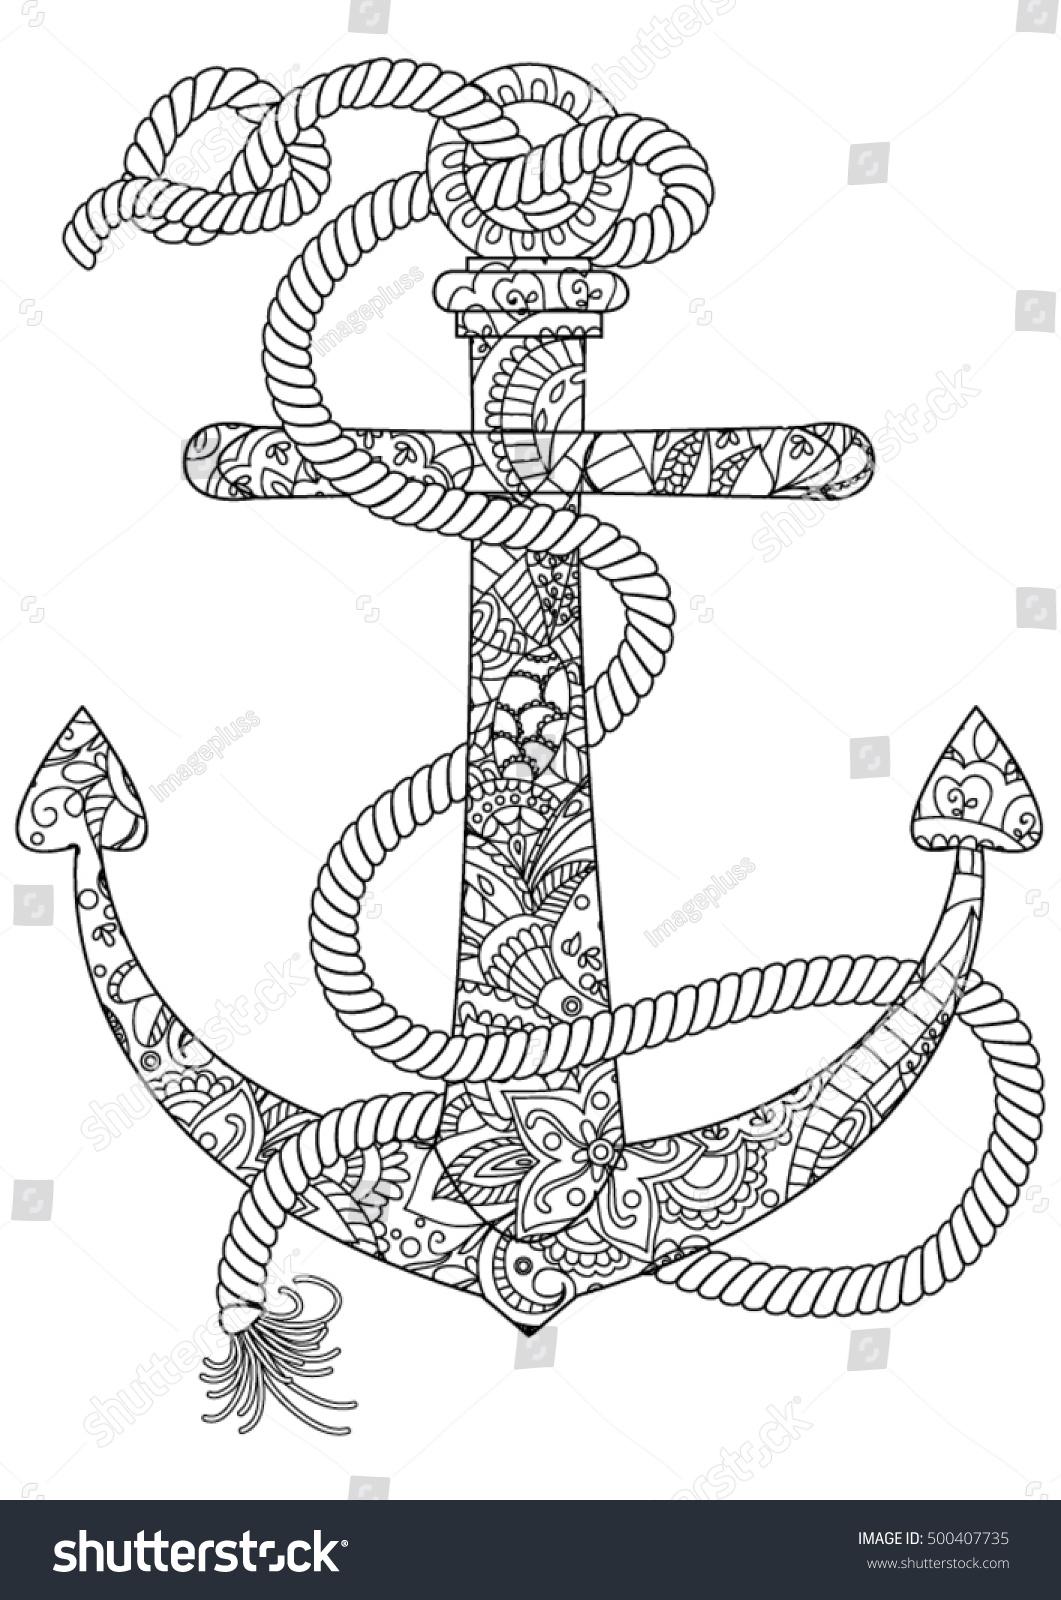 ocean coloring page anchor vectores en stock 500407735 shutterstock